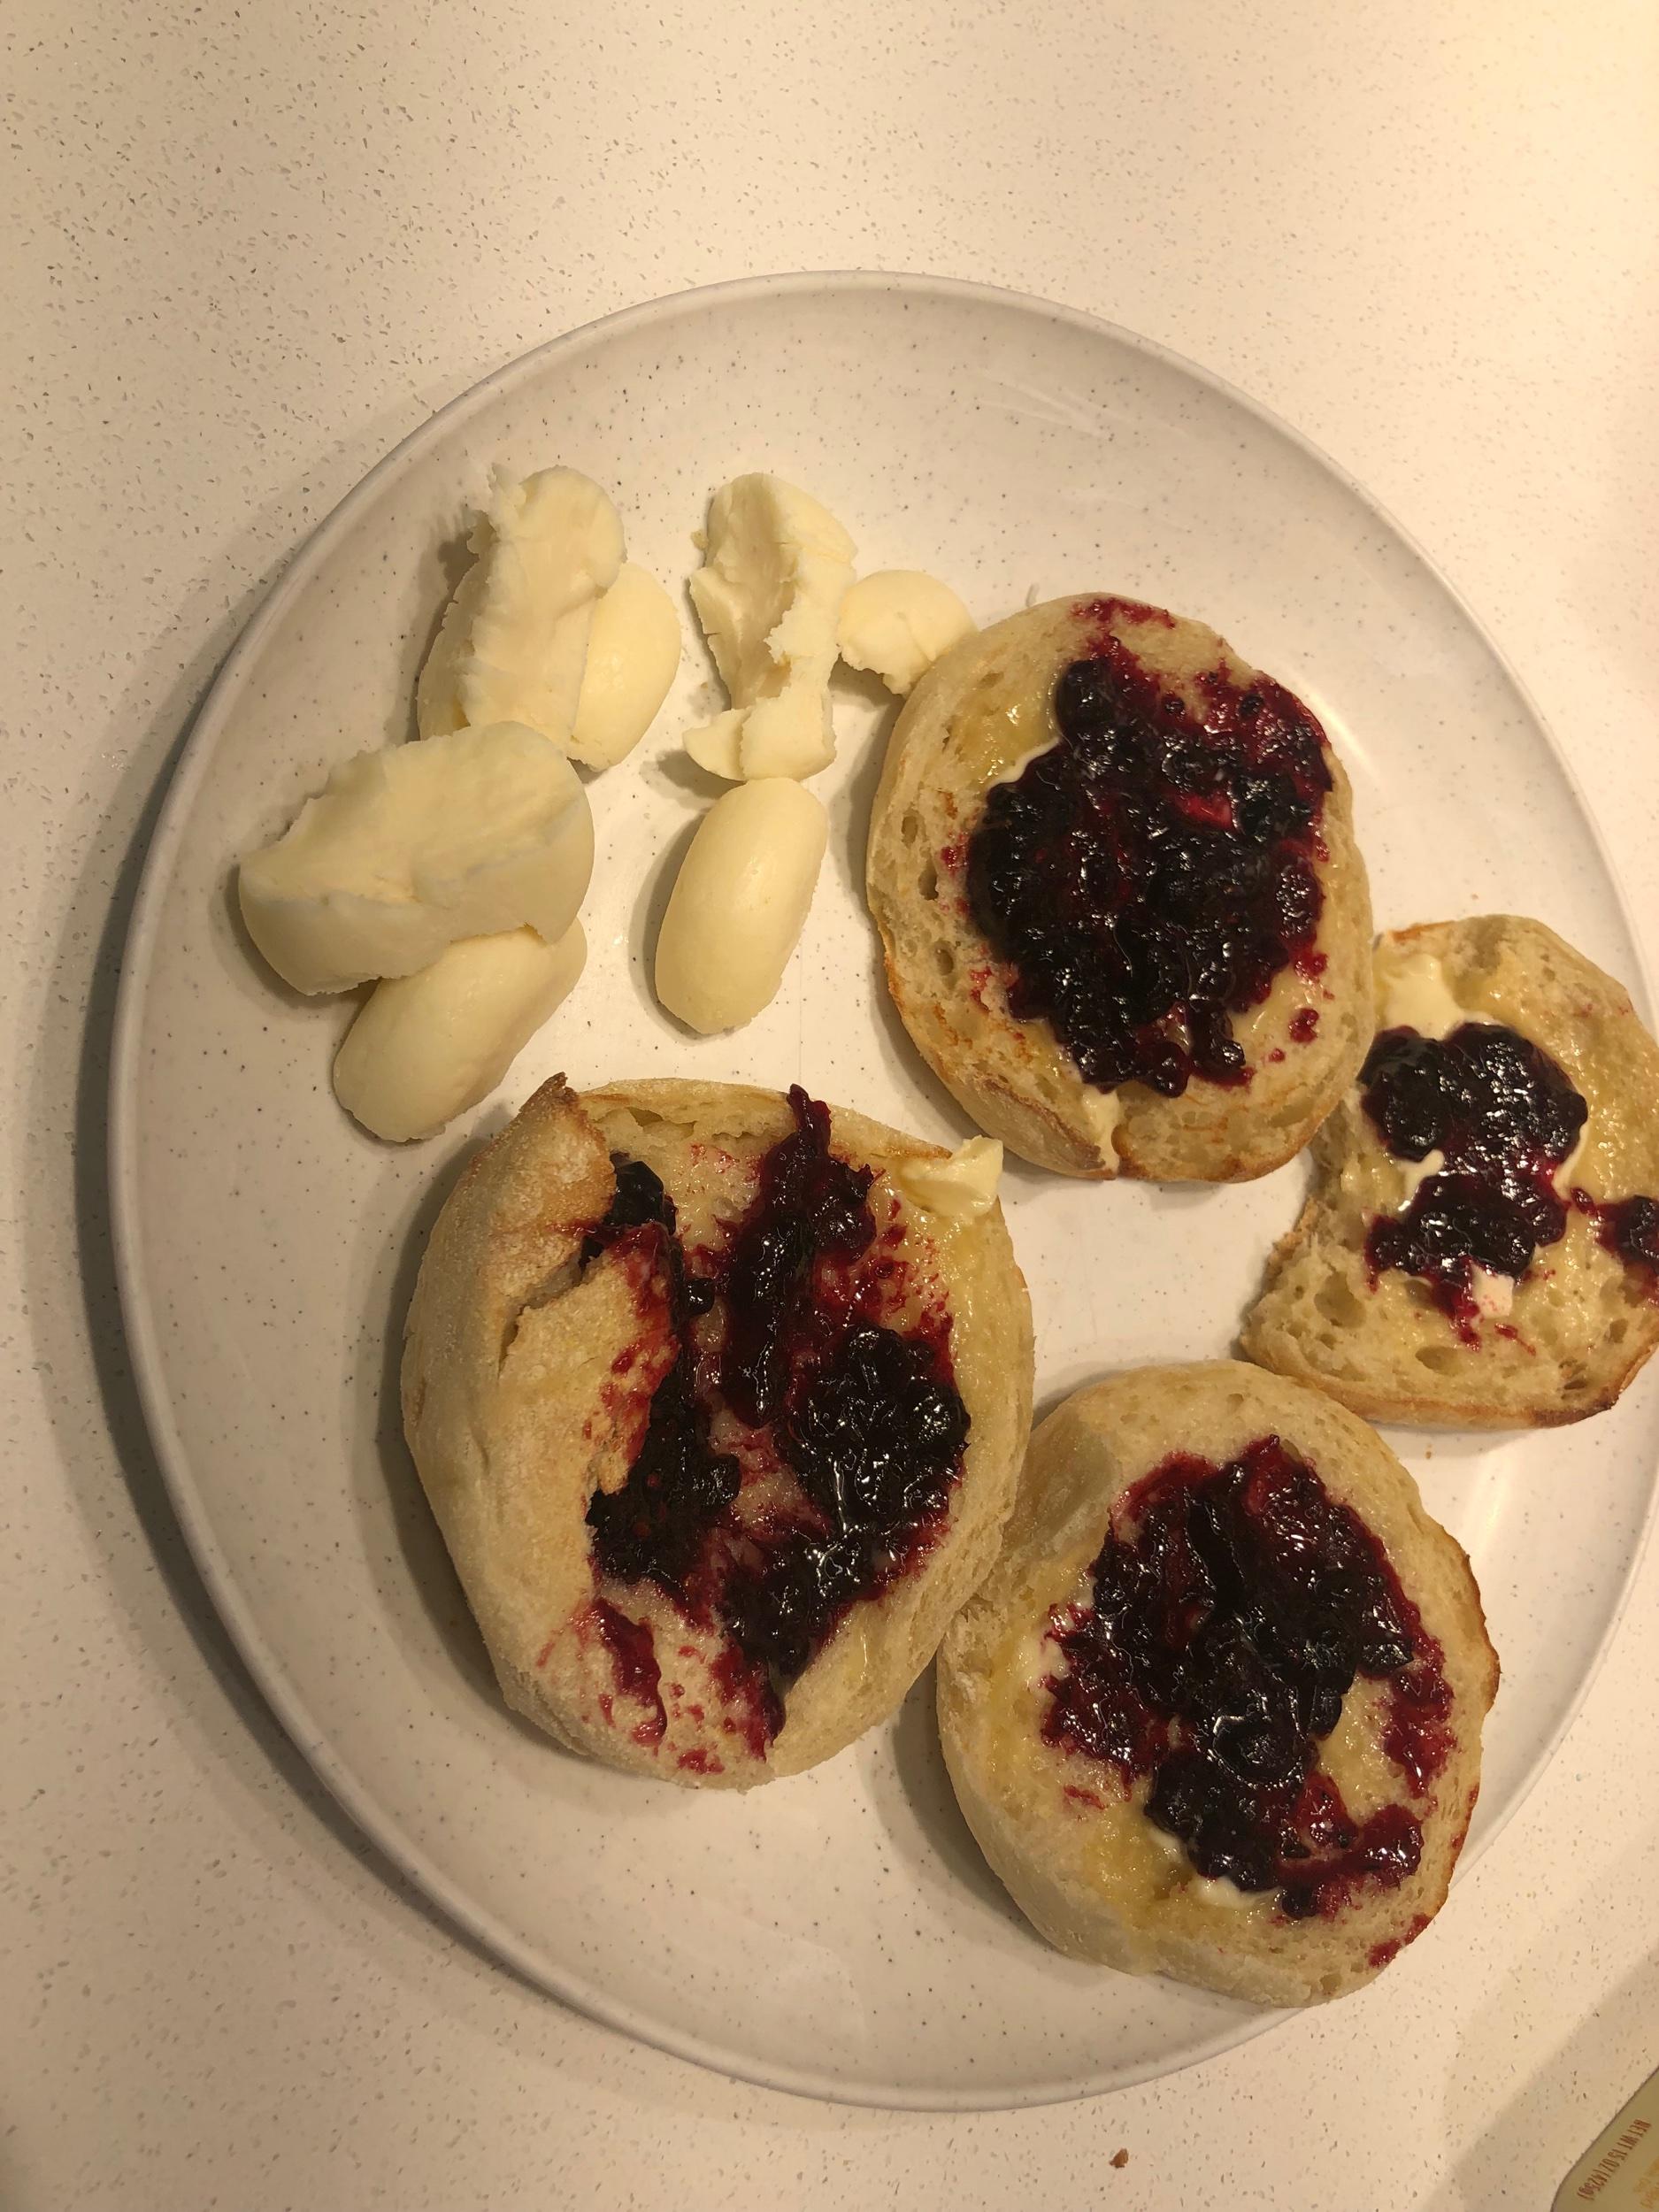 - English toast with Oregon Grape jam